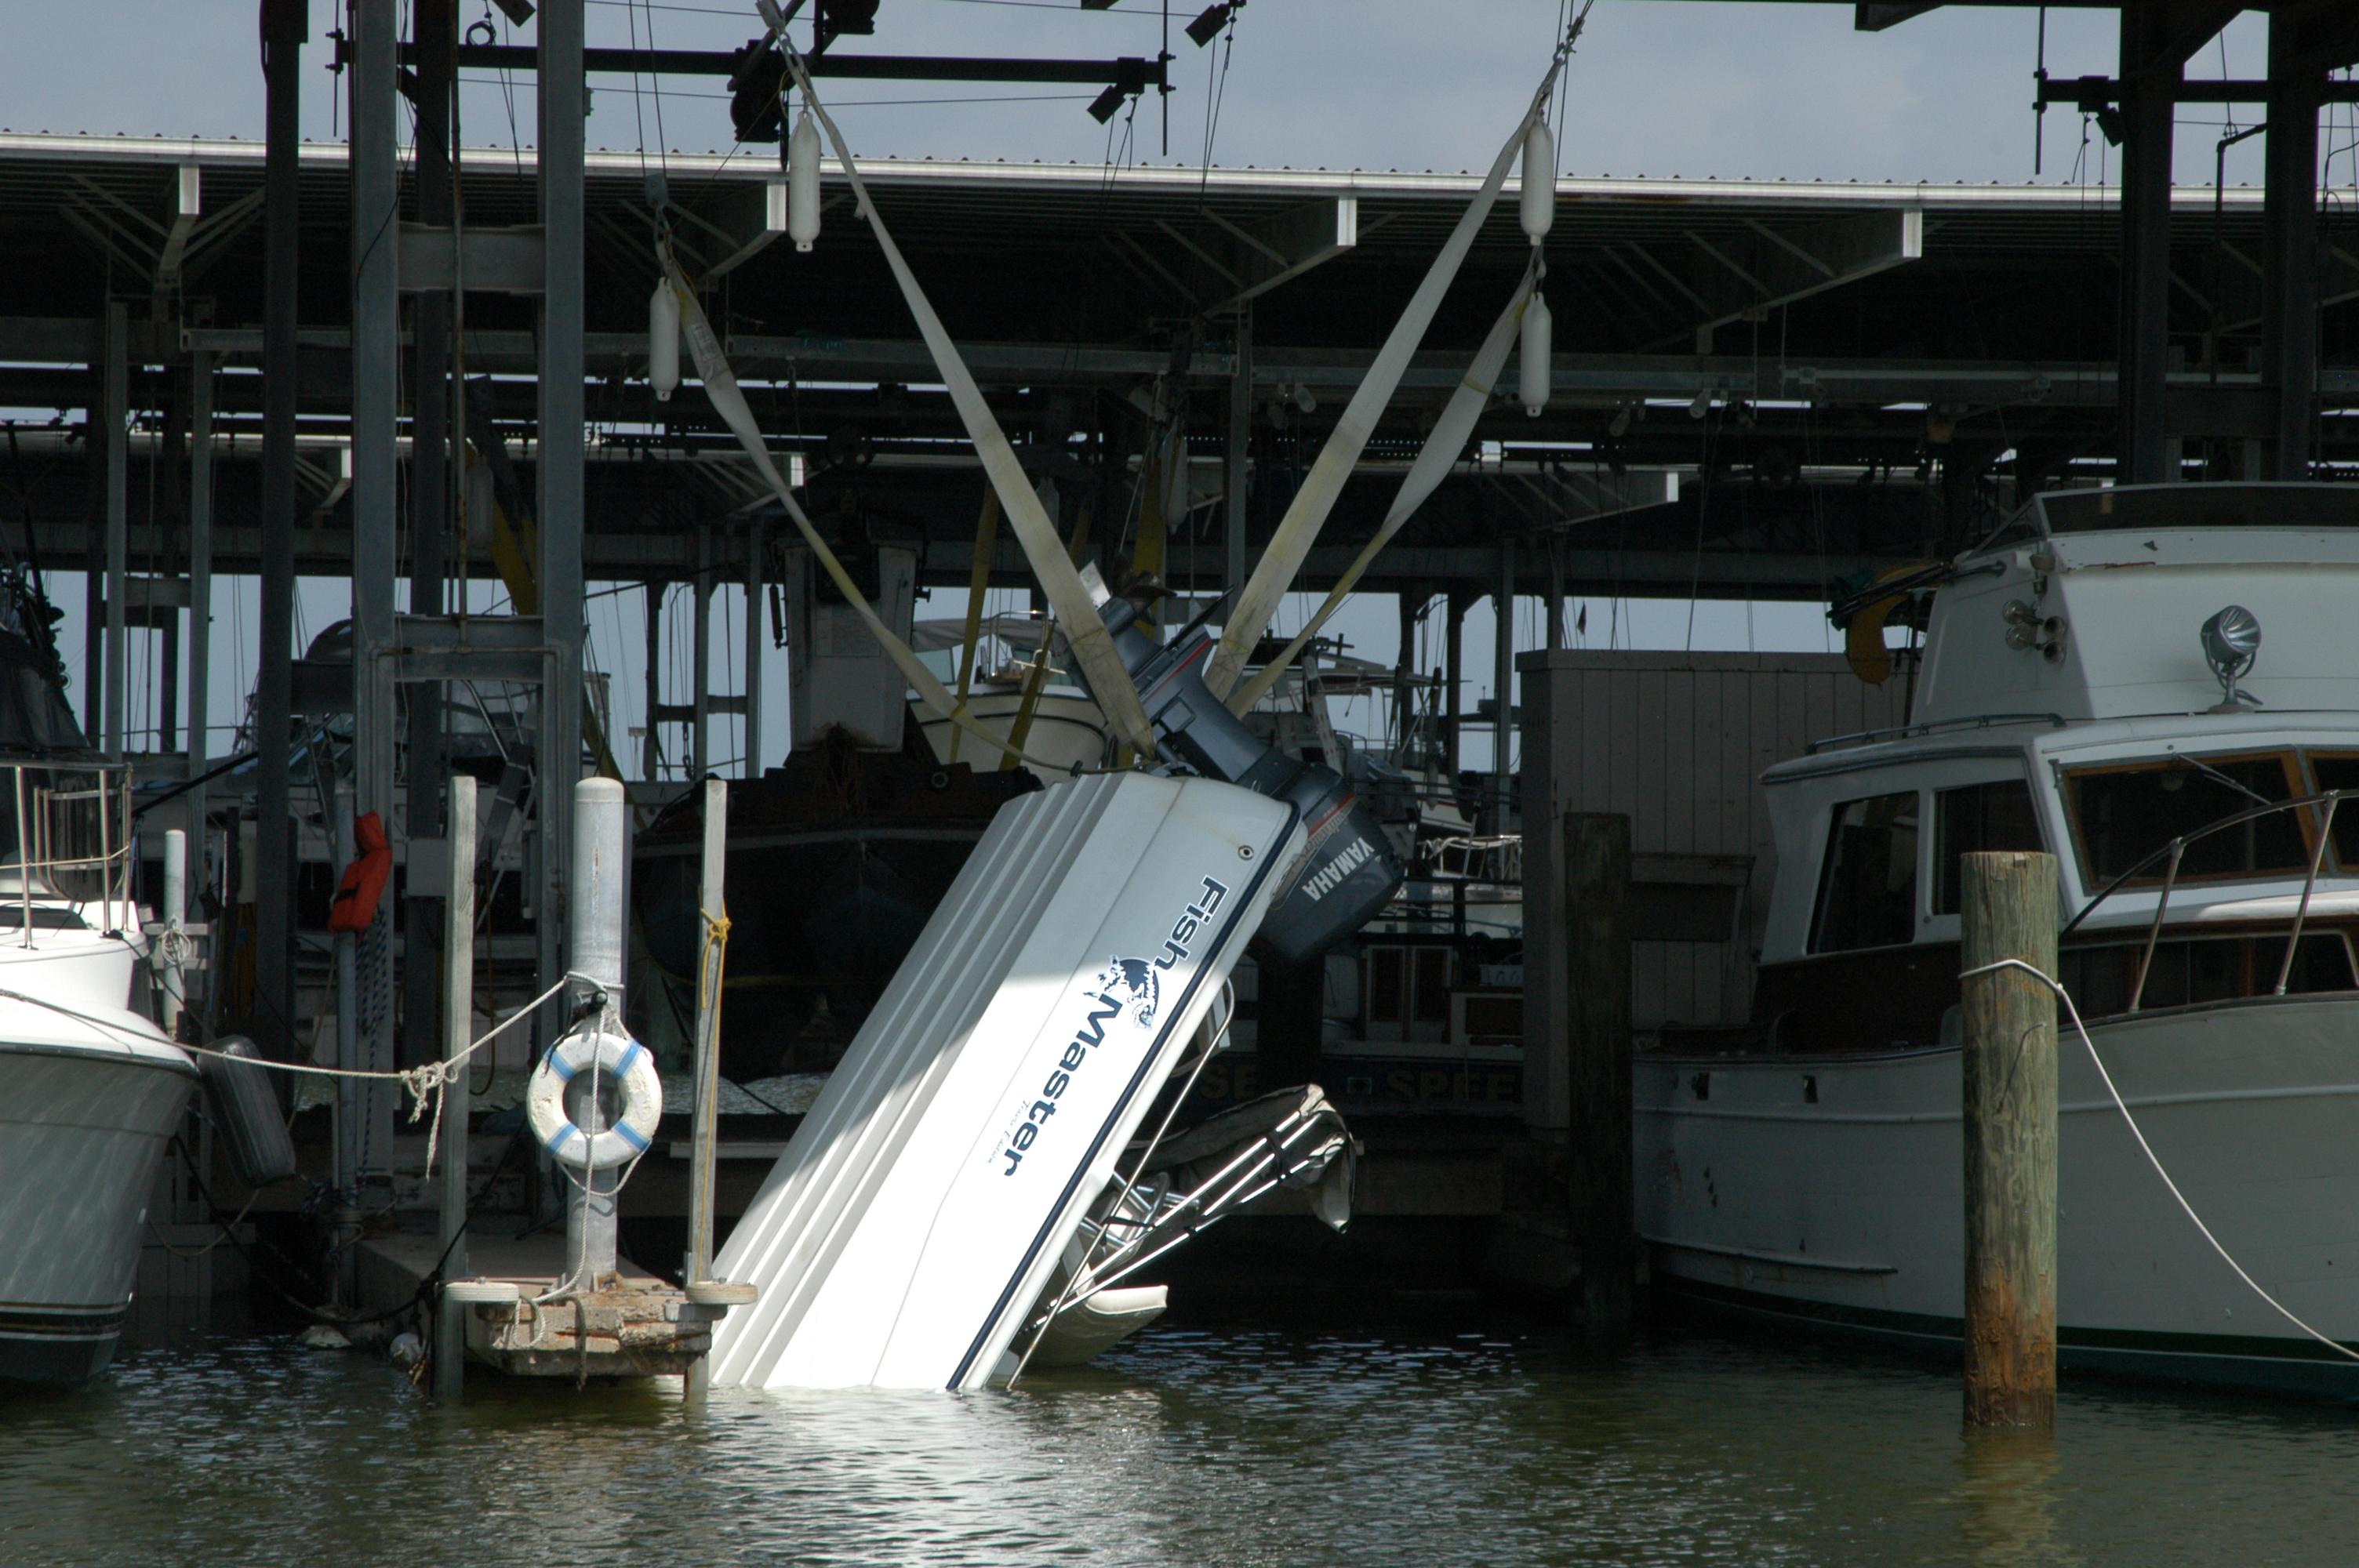 Damaged boats photos press room boatus for Outboard motor lifting strap